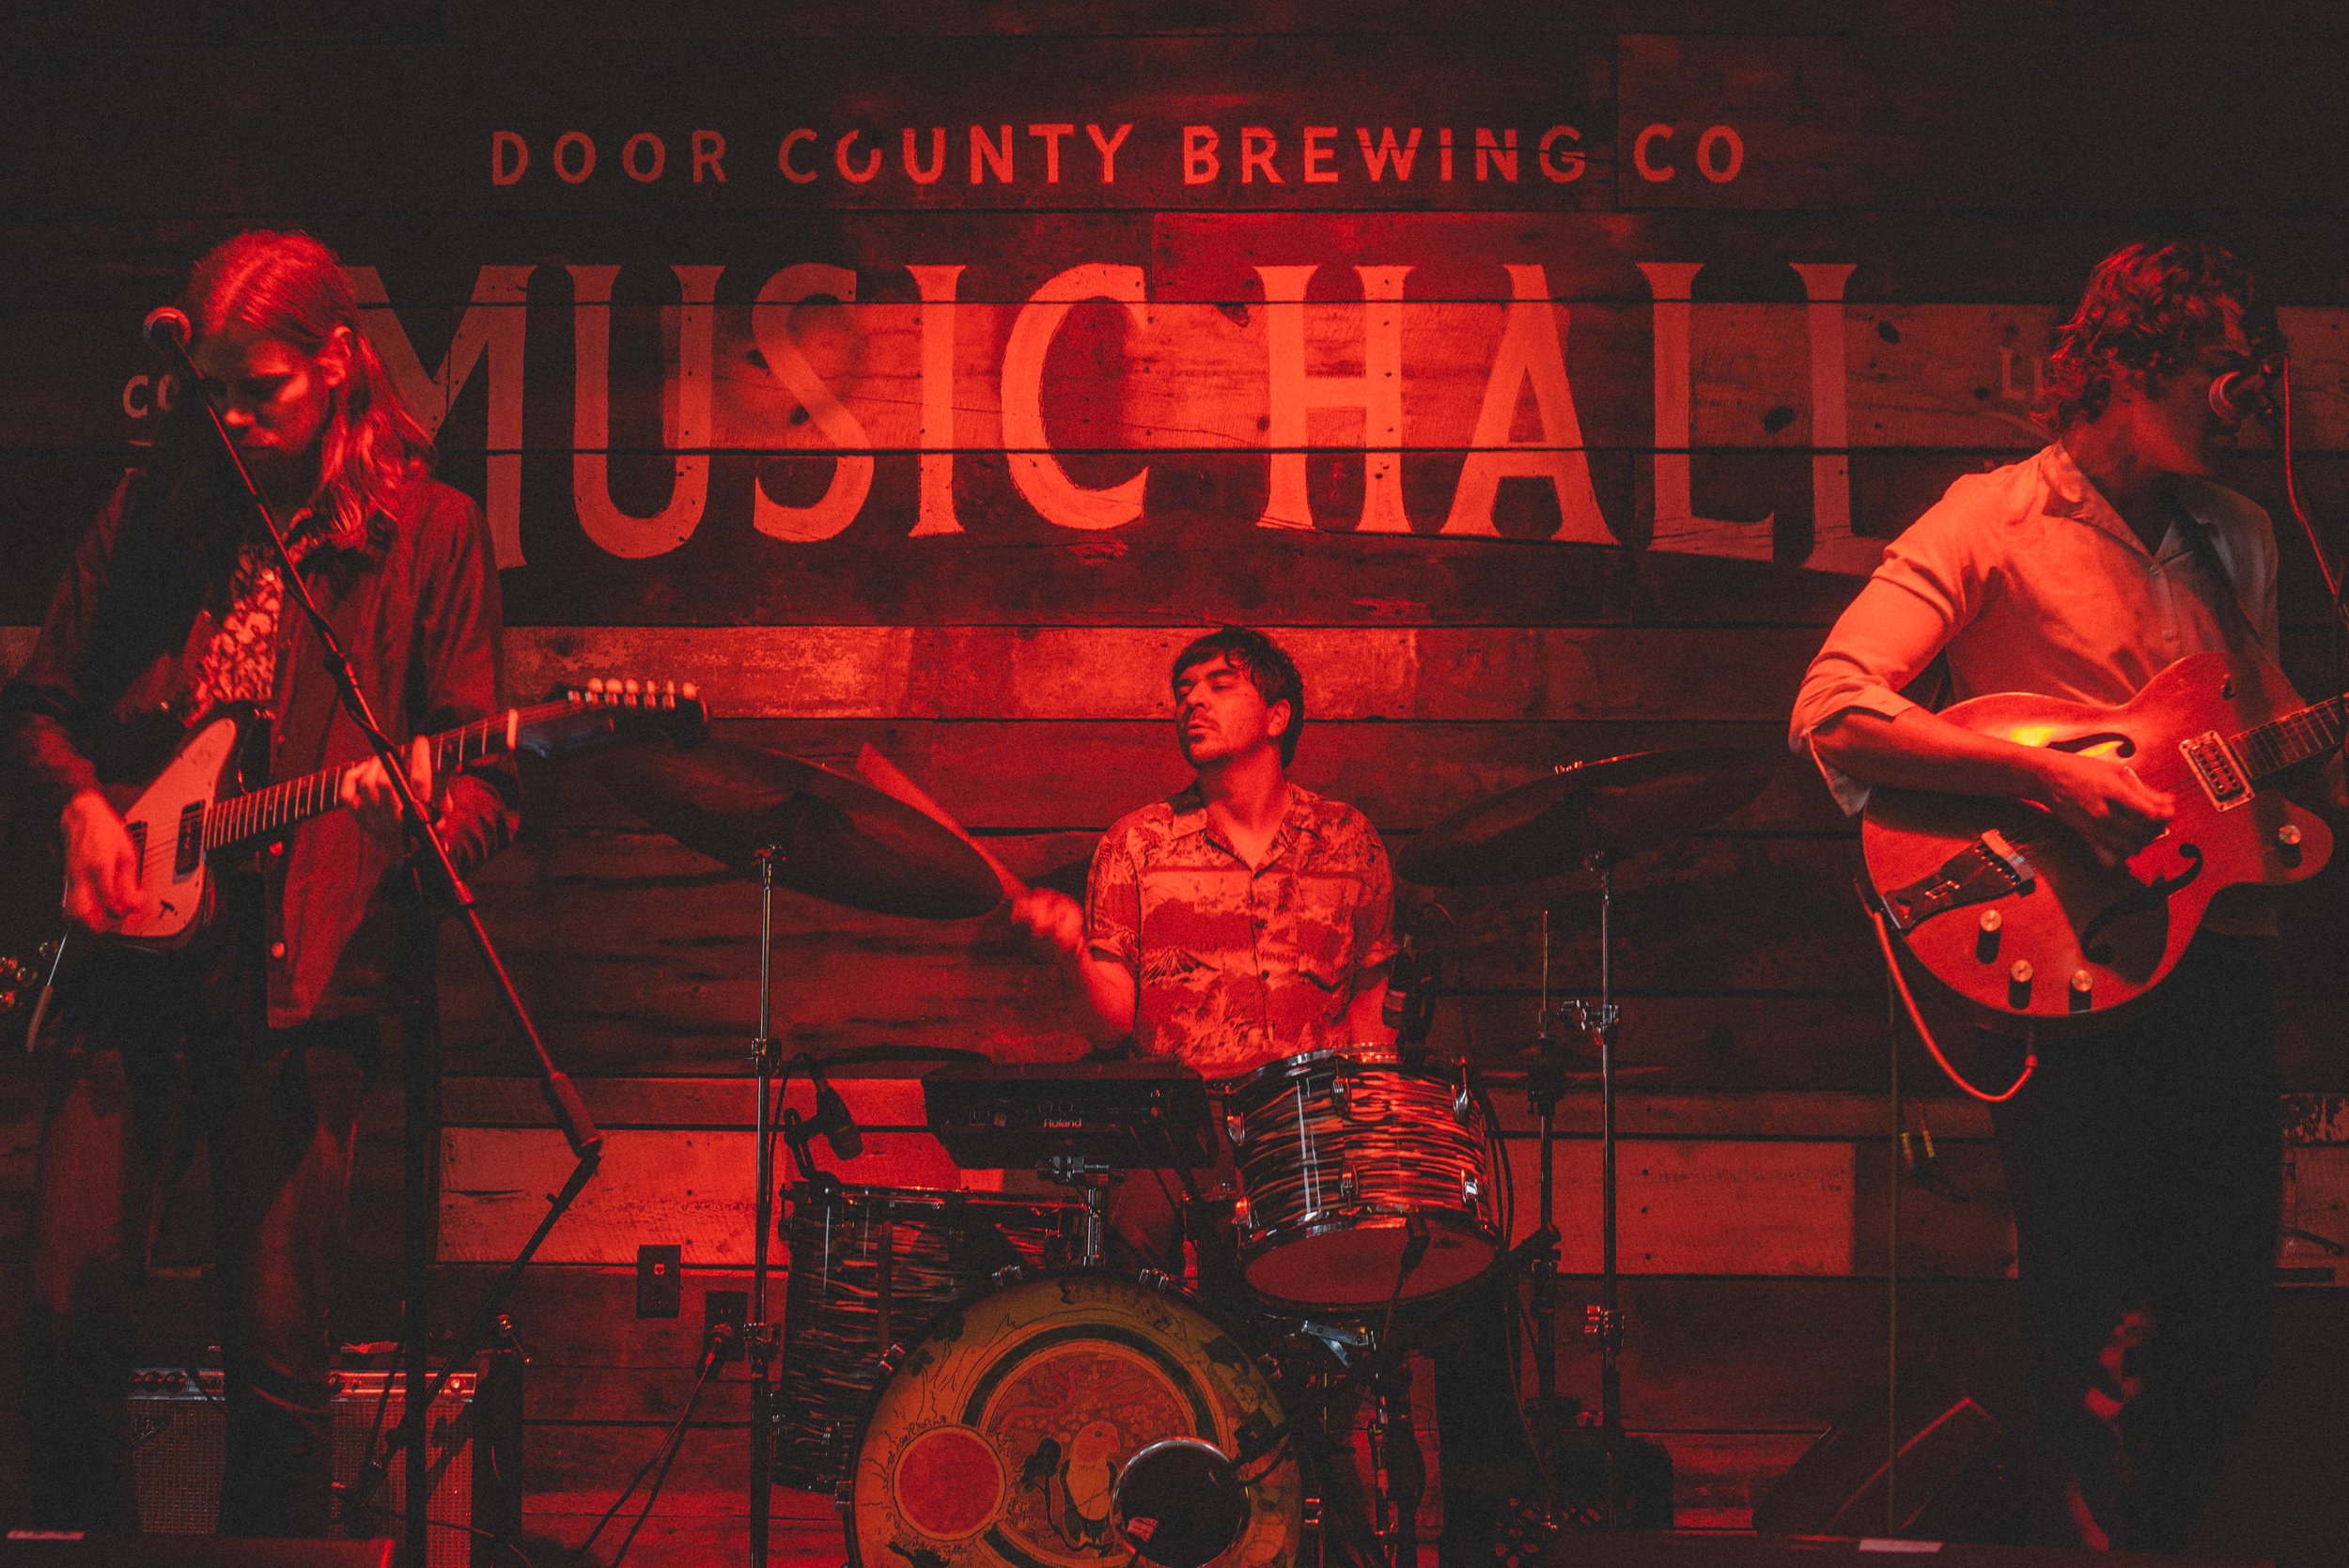 Night-Moves-Door-County-Brewing-Co-Music-Hall-6.jpg